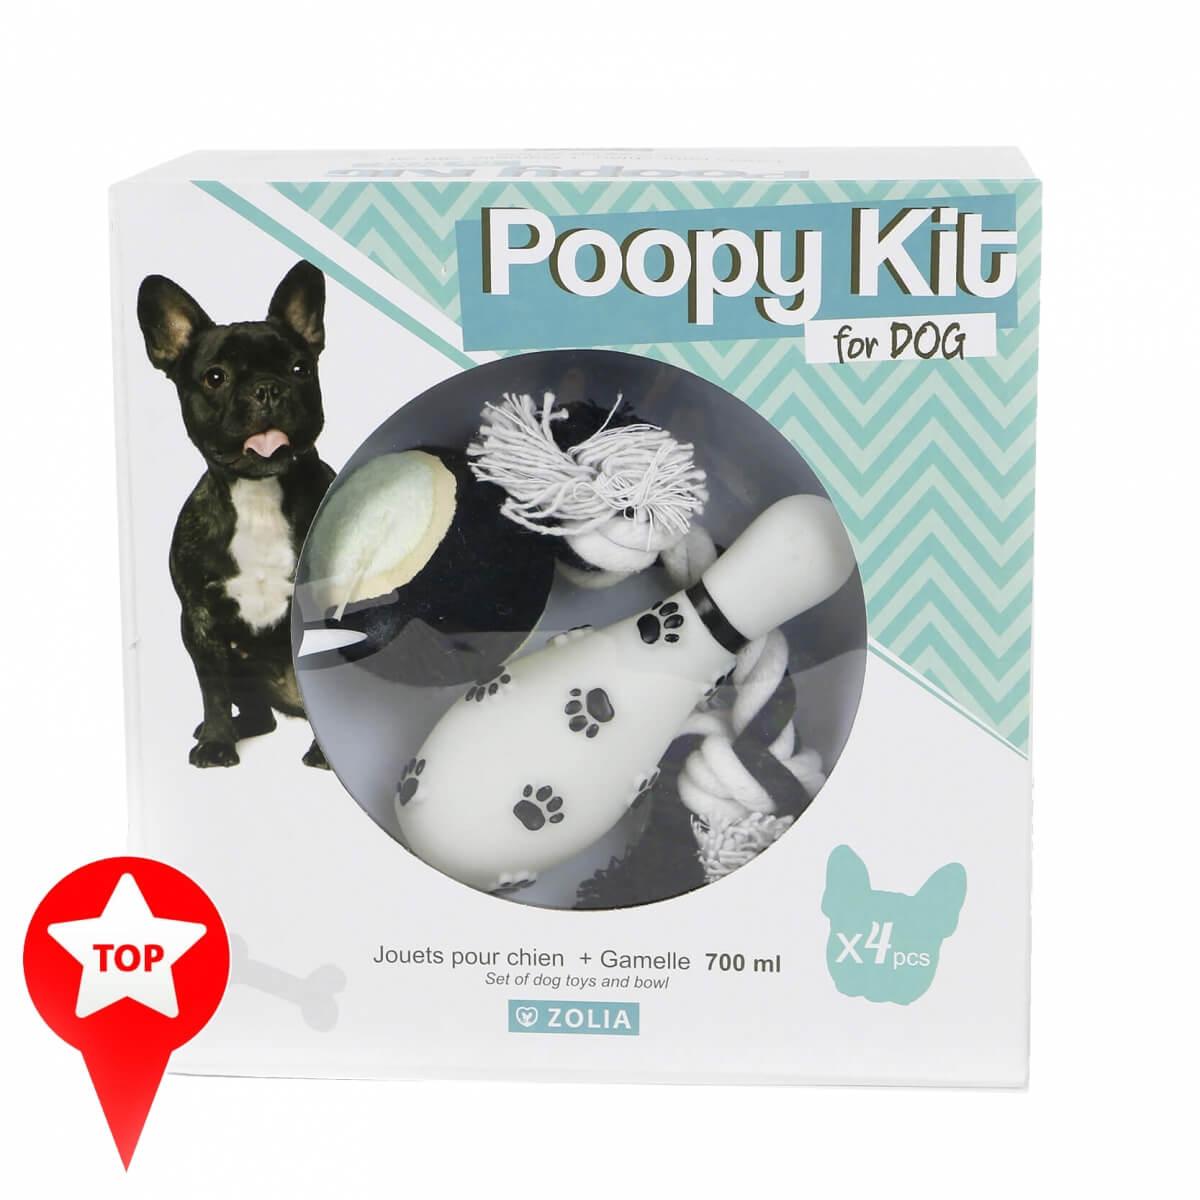 POOPY KIT for Dog Gamelle et Jouets pour chien _0